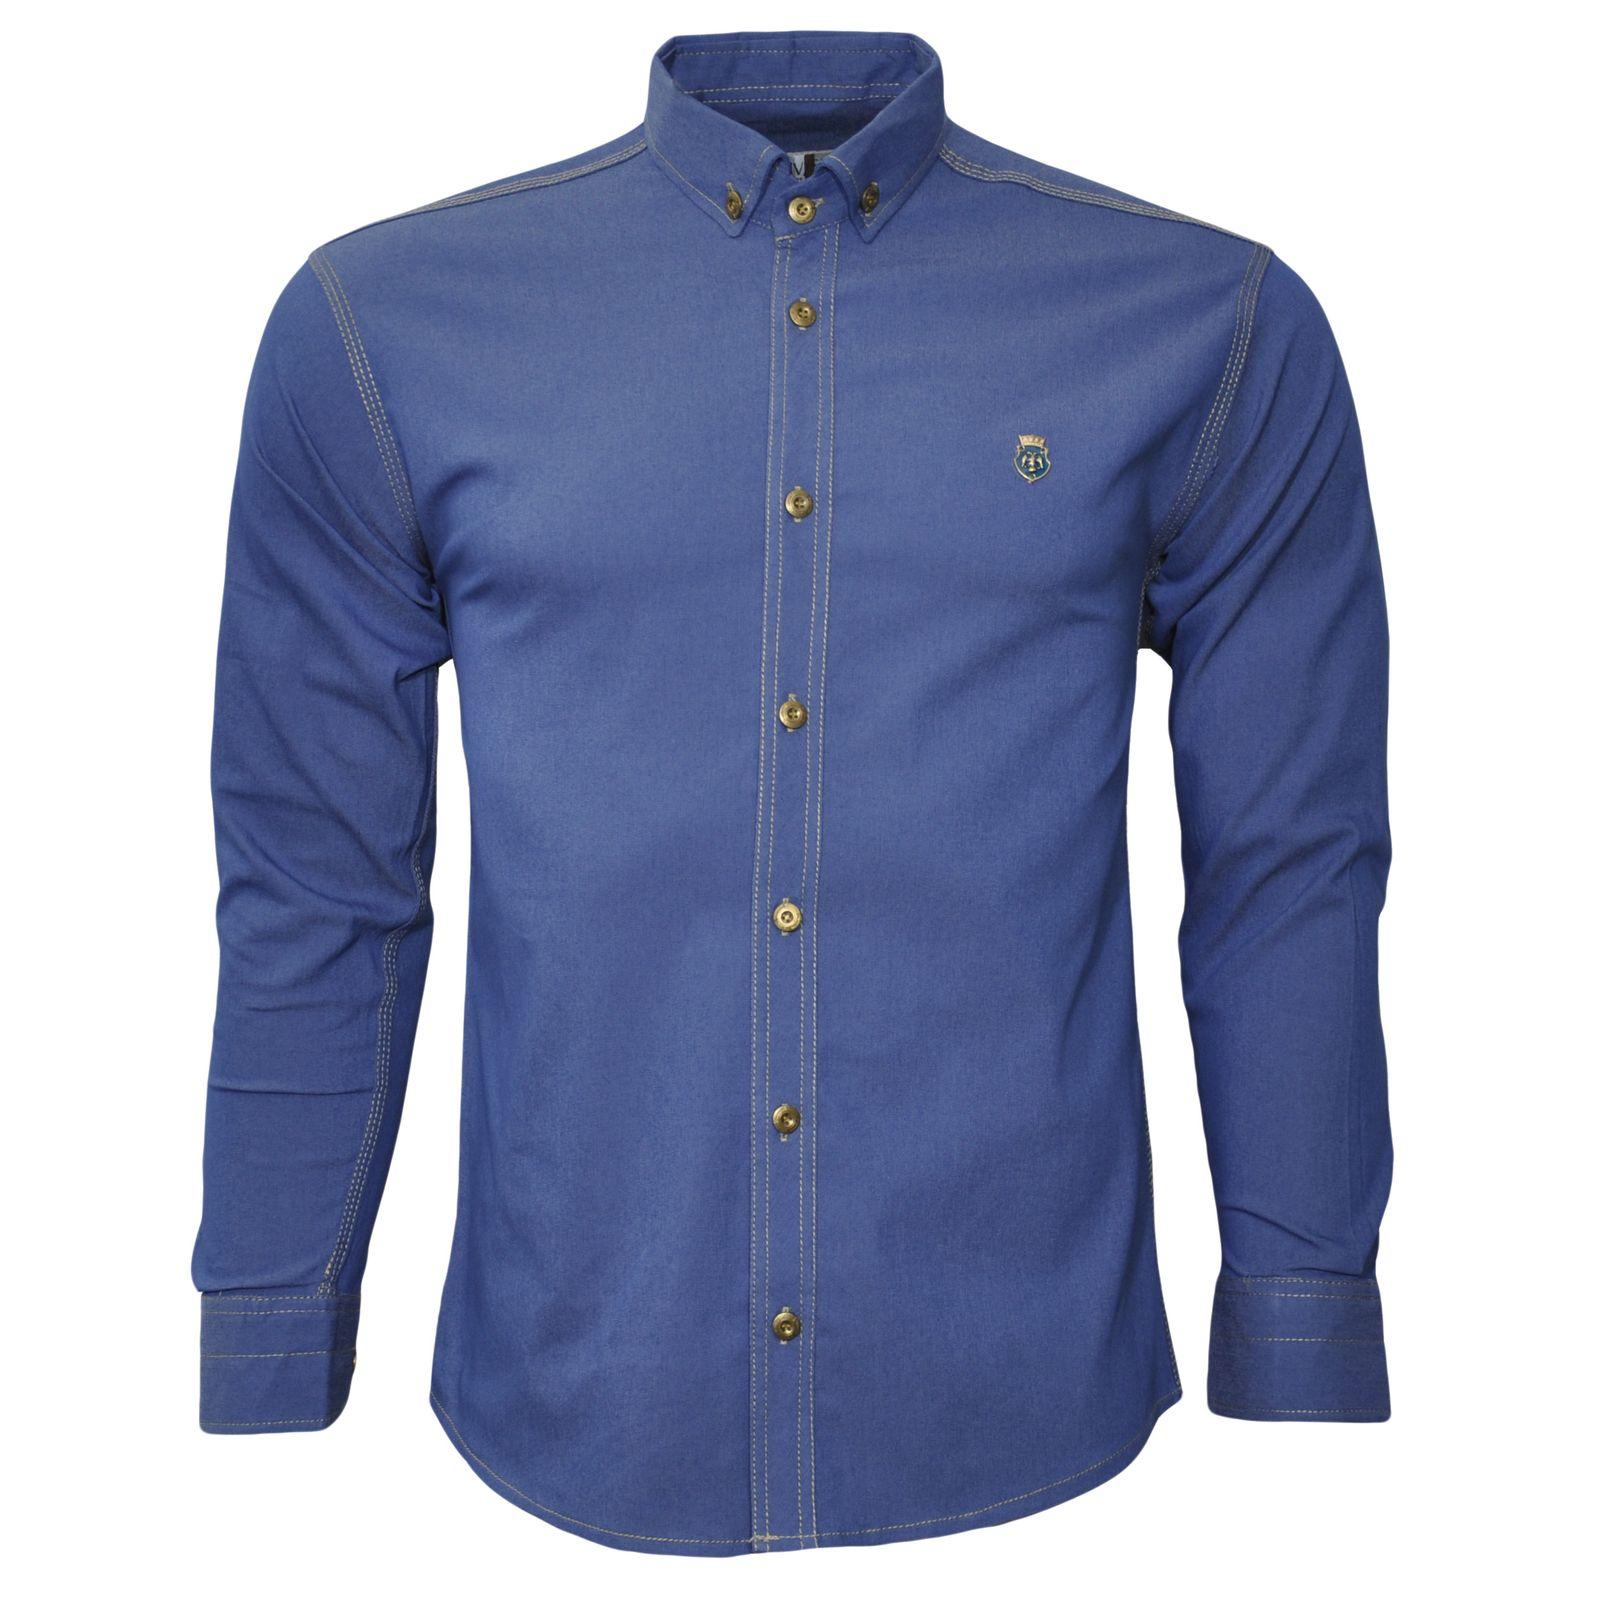 پیراهن مردانه مدل ten003 -  - 2